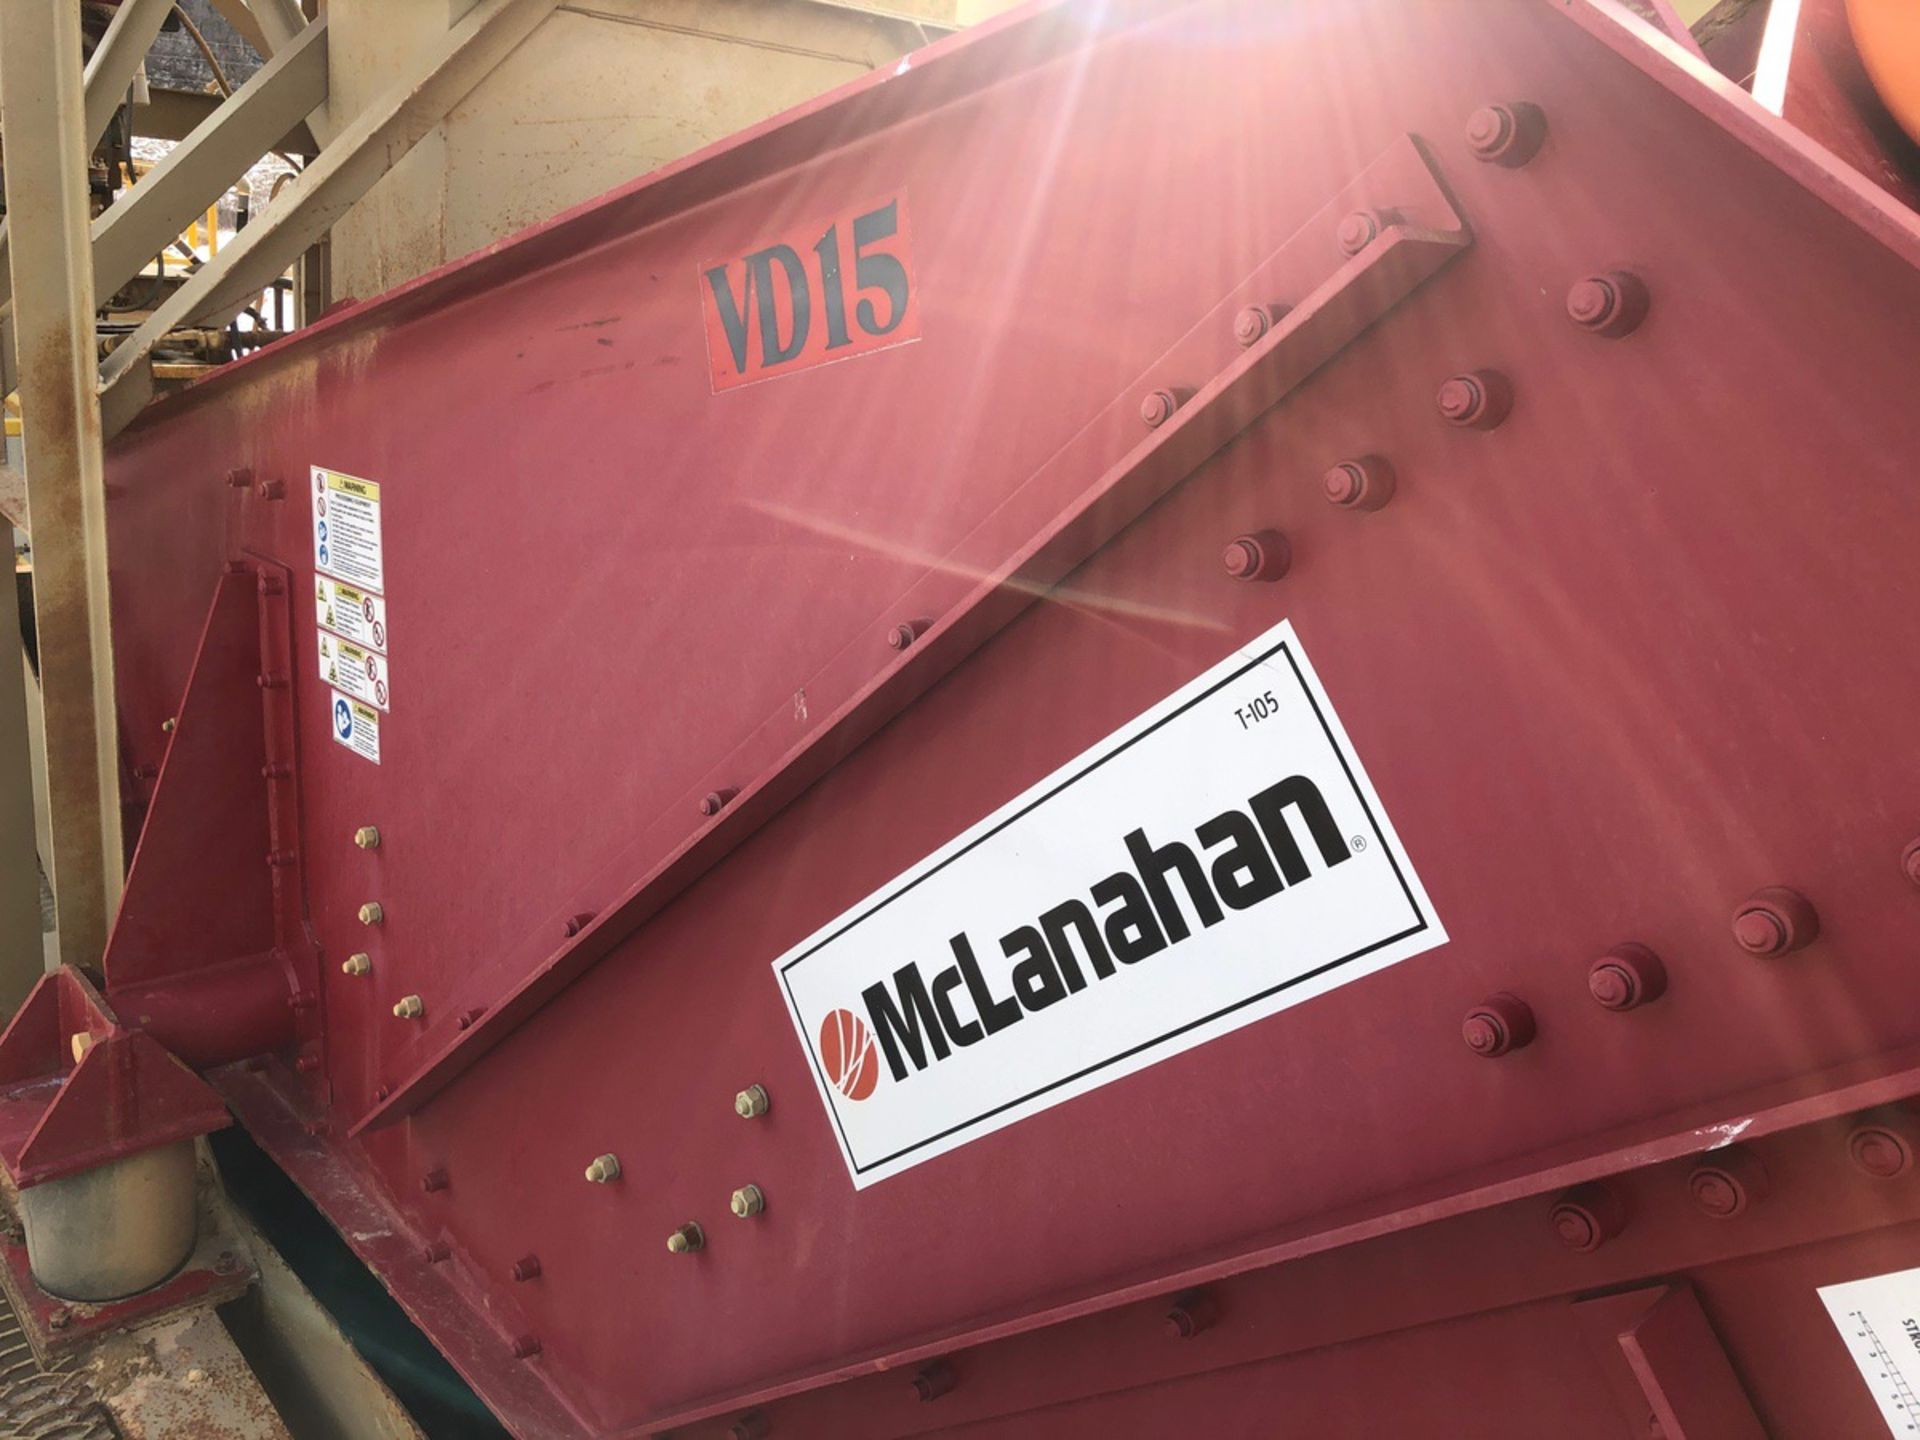 McLanahan Model VD15 5' x 12' Single Deck Dewatering Screen, S/N 20123080, Asset #DWS - Subj to Bulk - Image 2 of 3